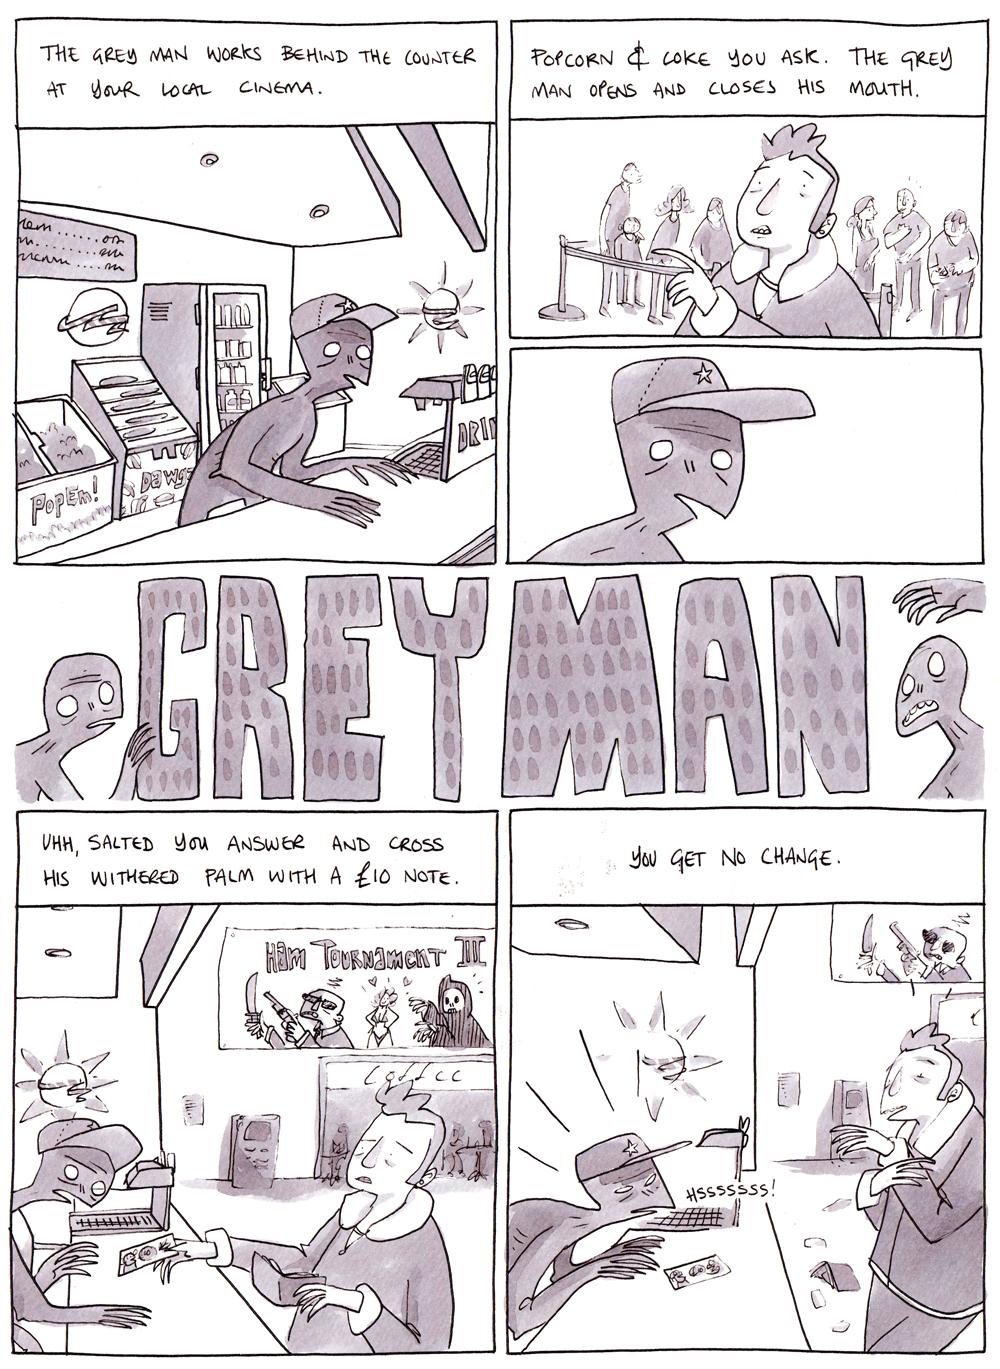 GreyMan002_web